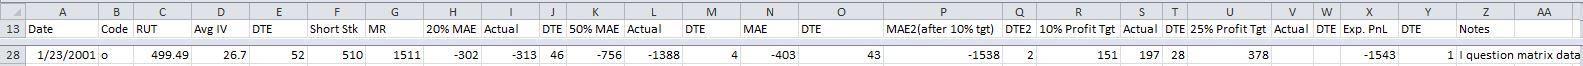 Bullish butterfly spreadsheet (2-25-17)